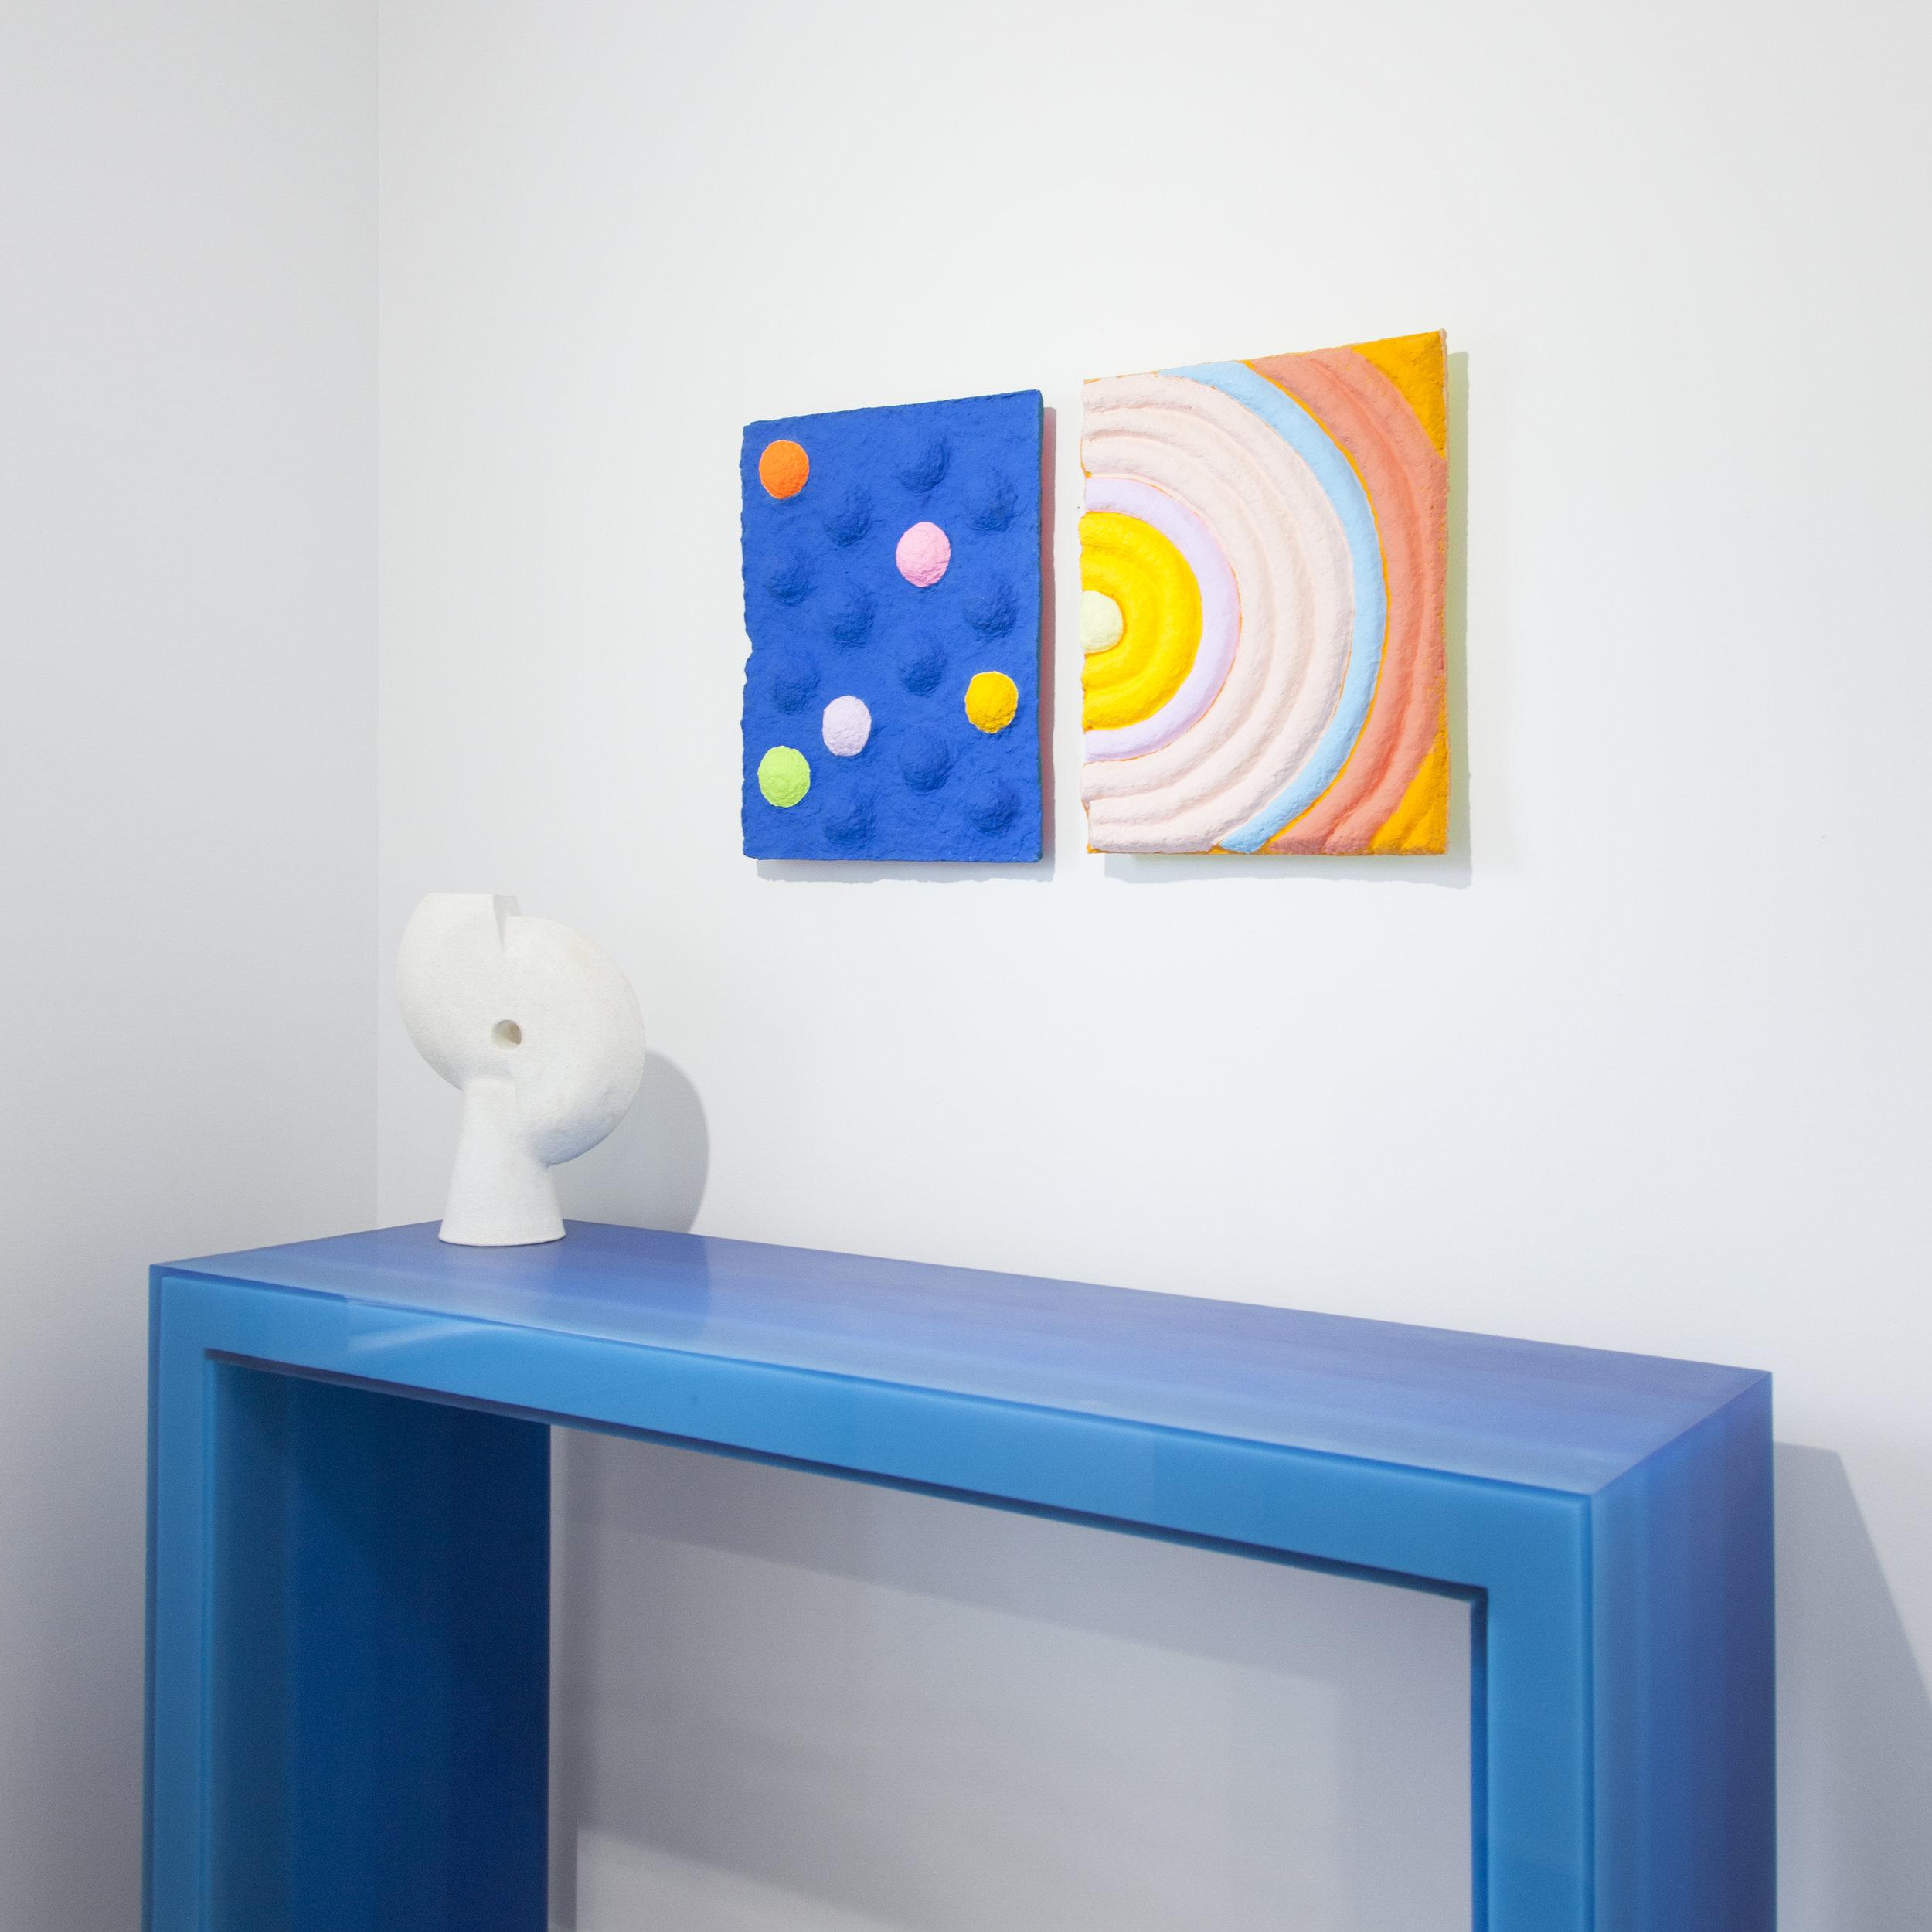 Facture Console-Chiaozza Paintings-Humble Matter Vase 2.jpg